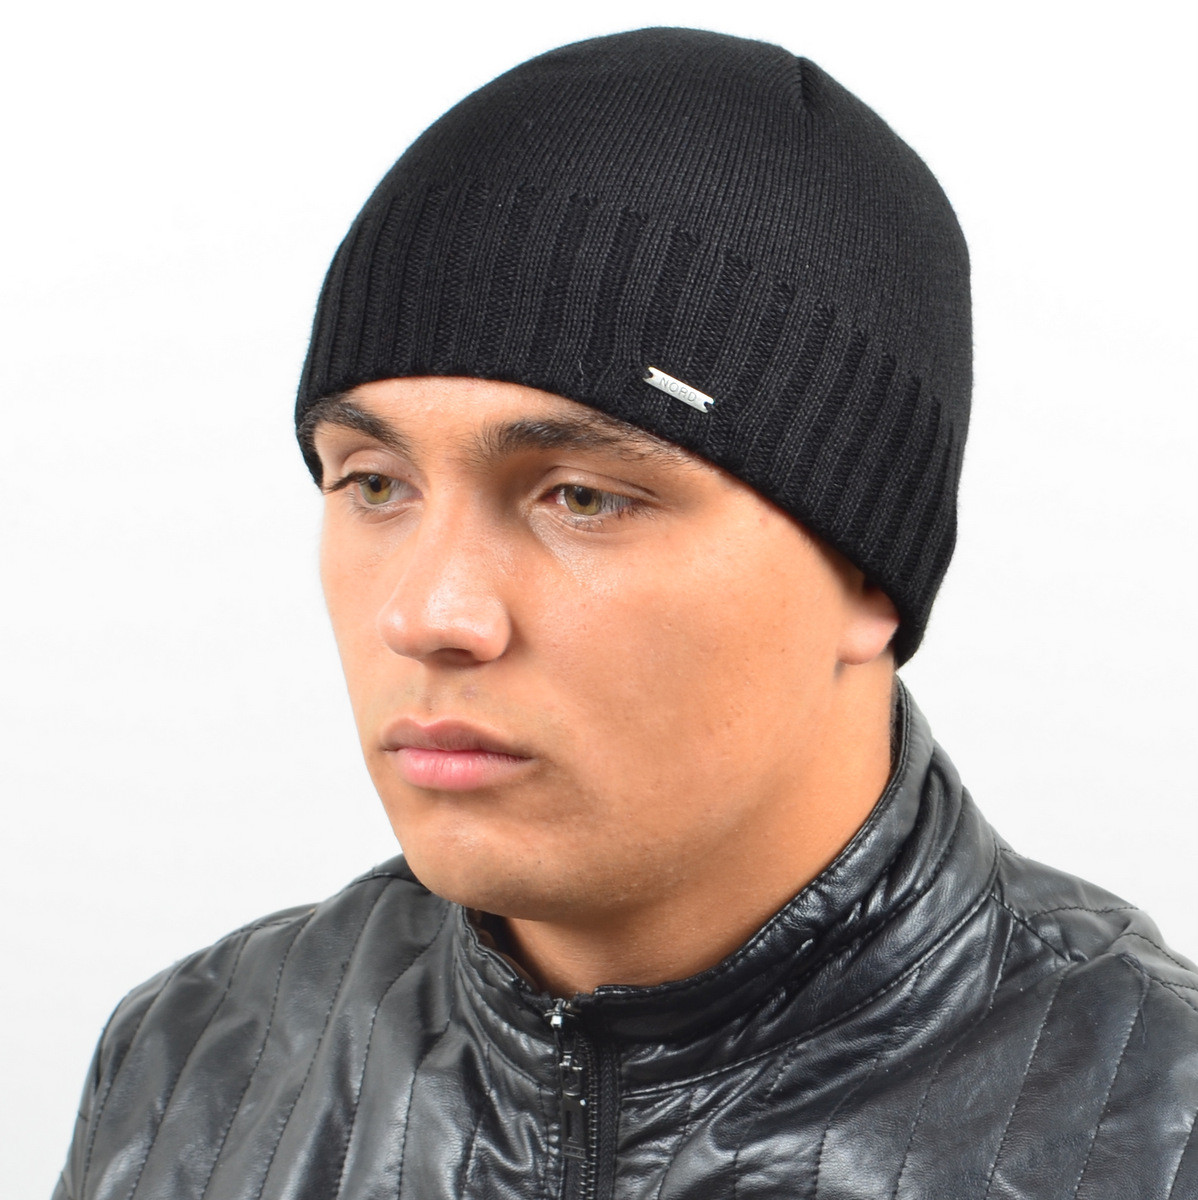 Мужская вязанная шапка NORD черный